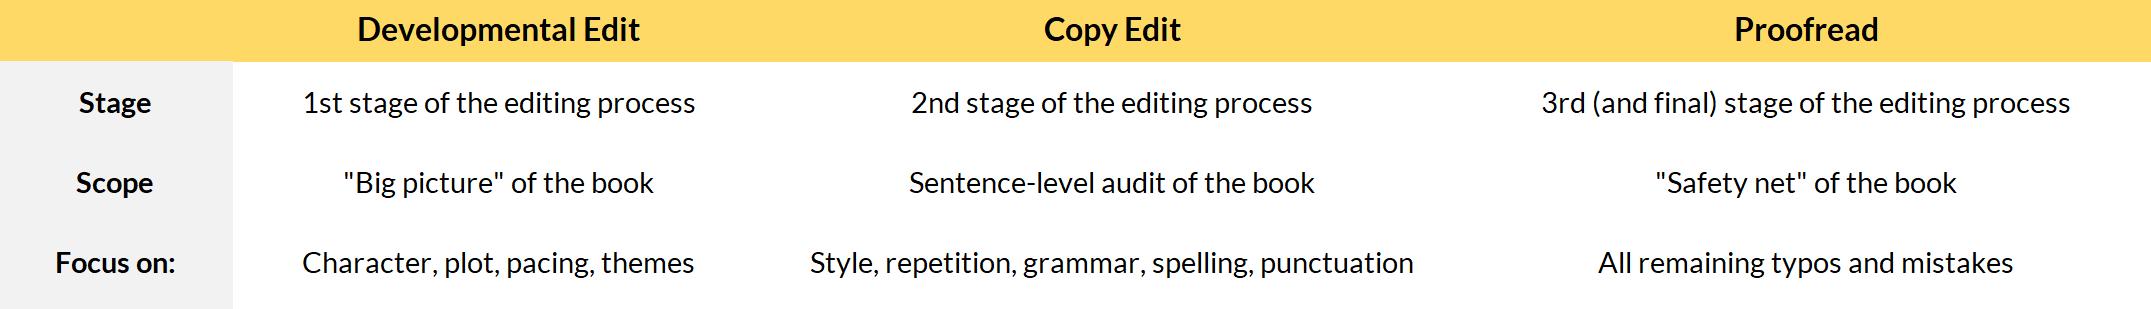 Table Developmental Edit vs Copy Edit vs Proofread